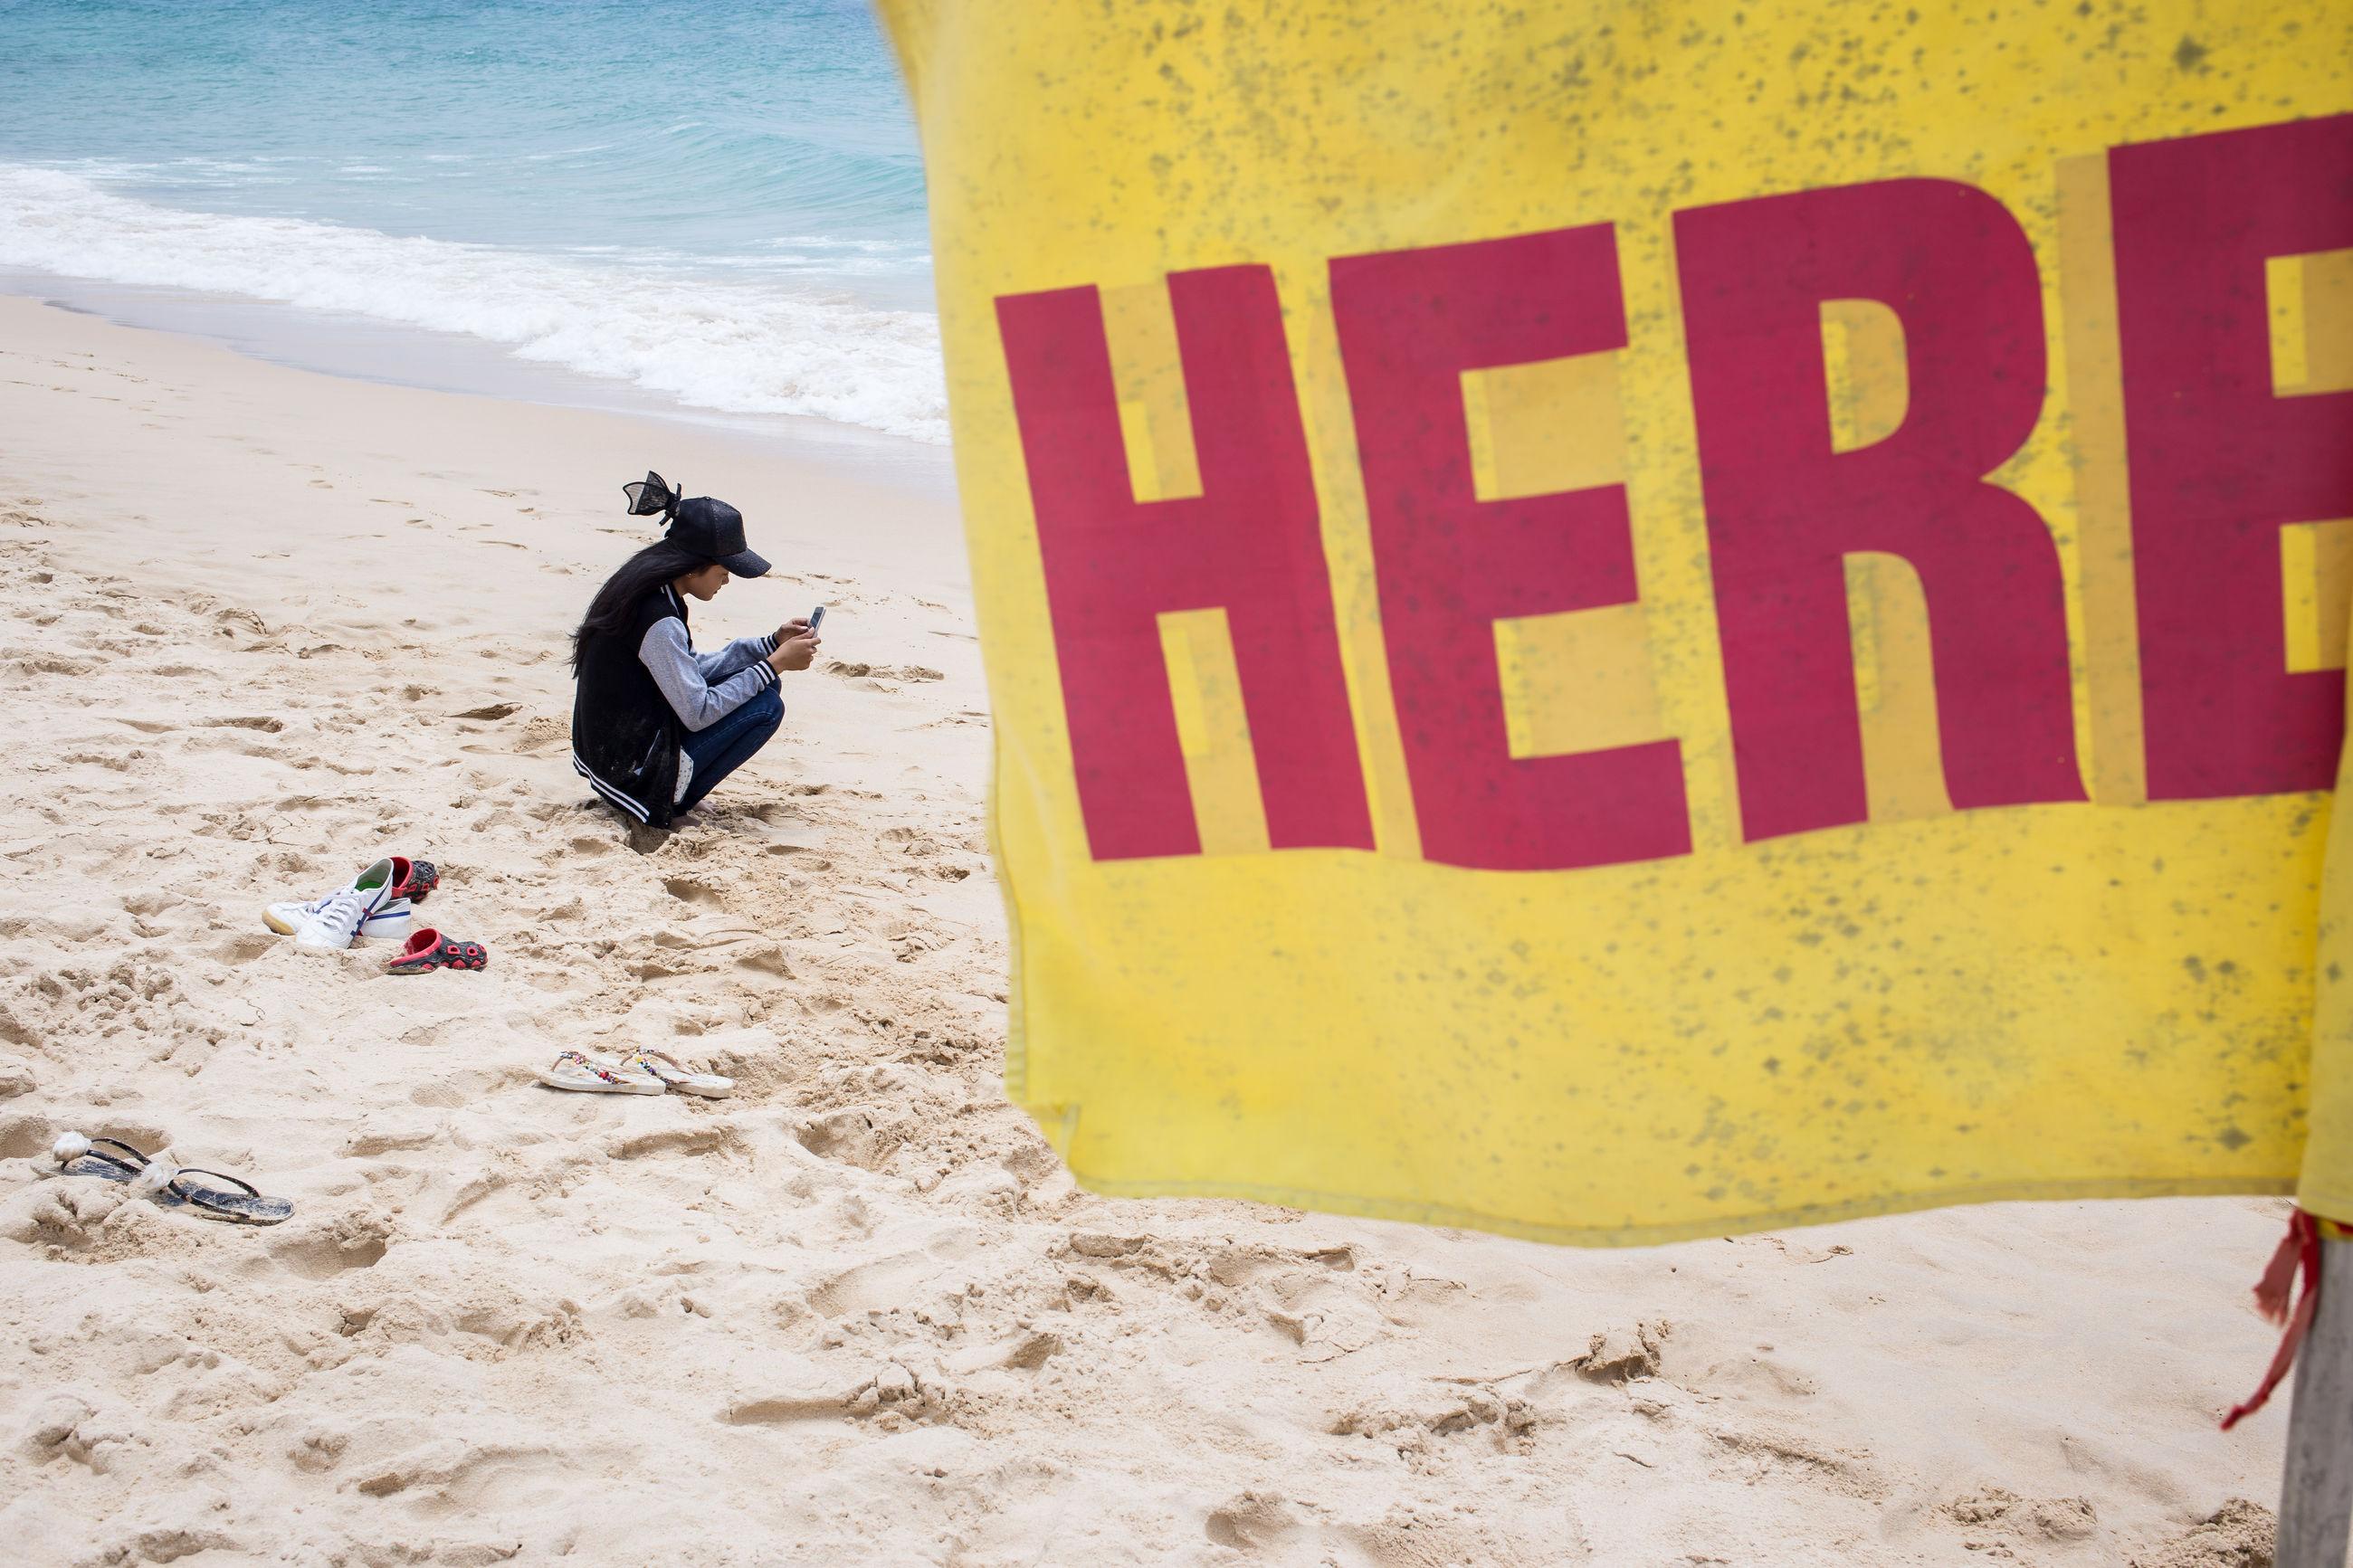 MAN WITH TEXT ON BEACH